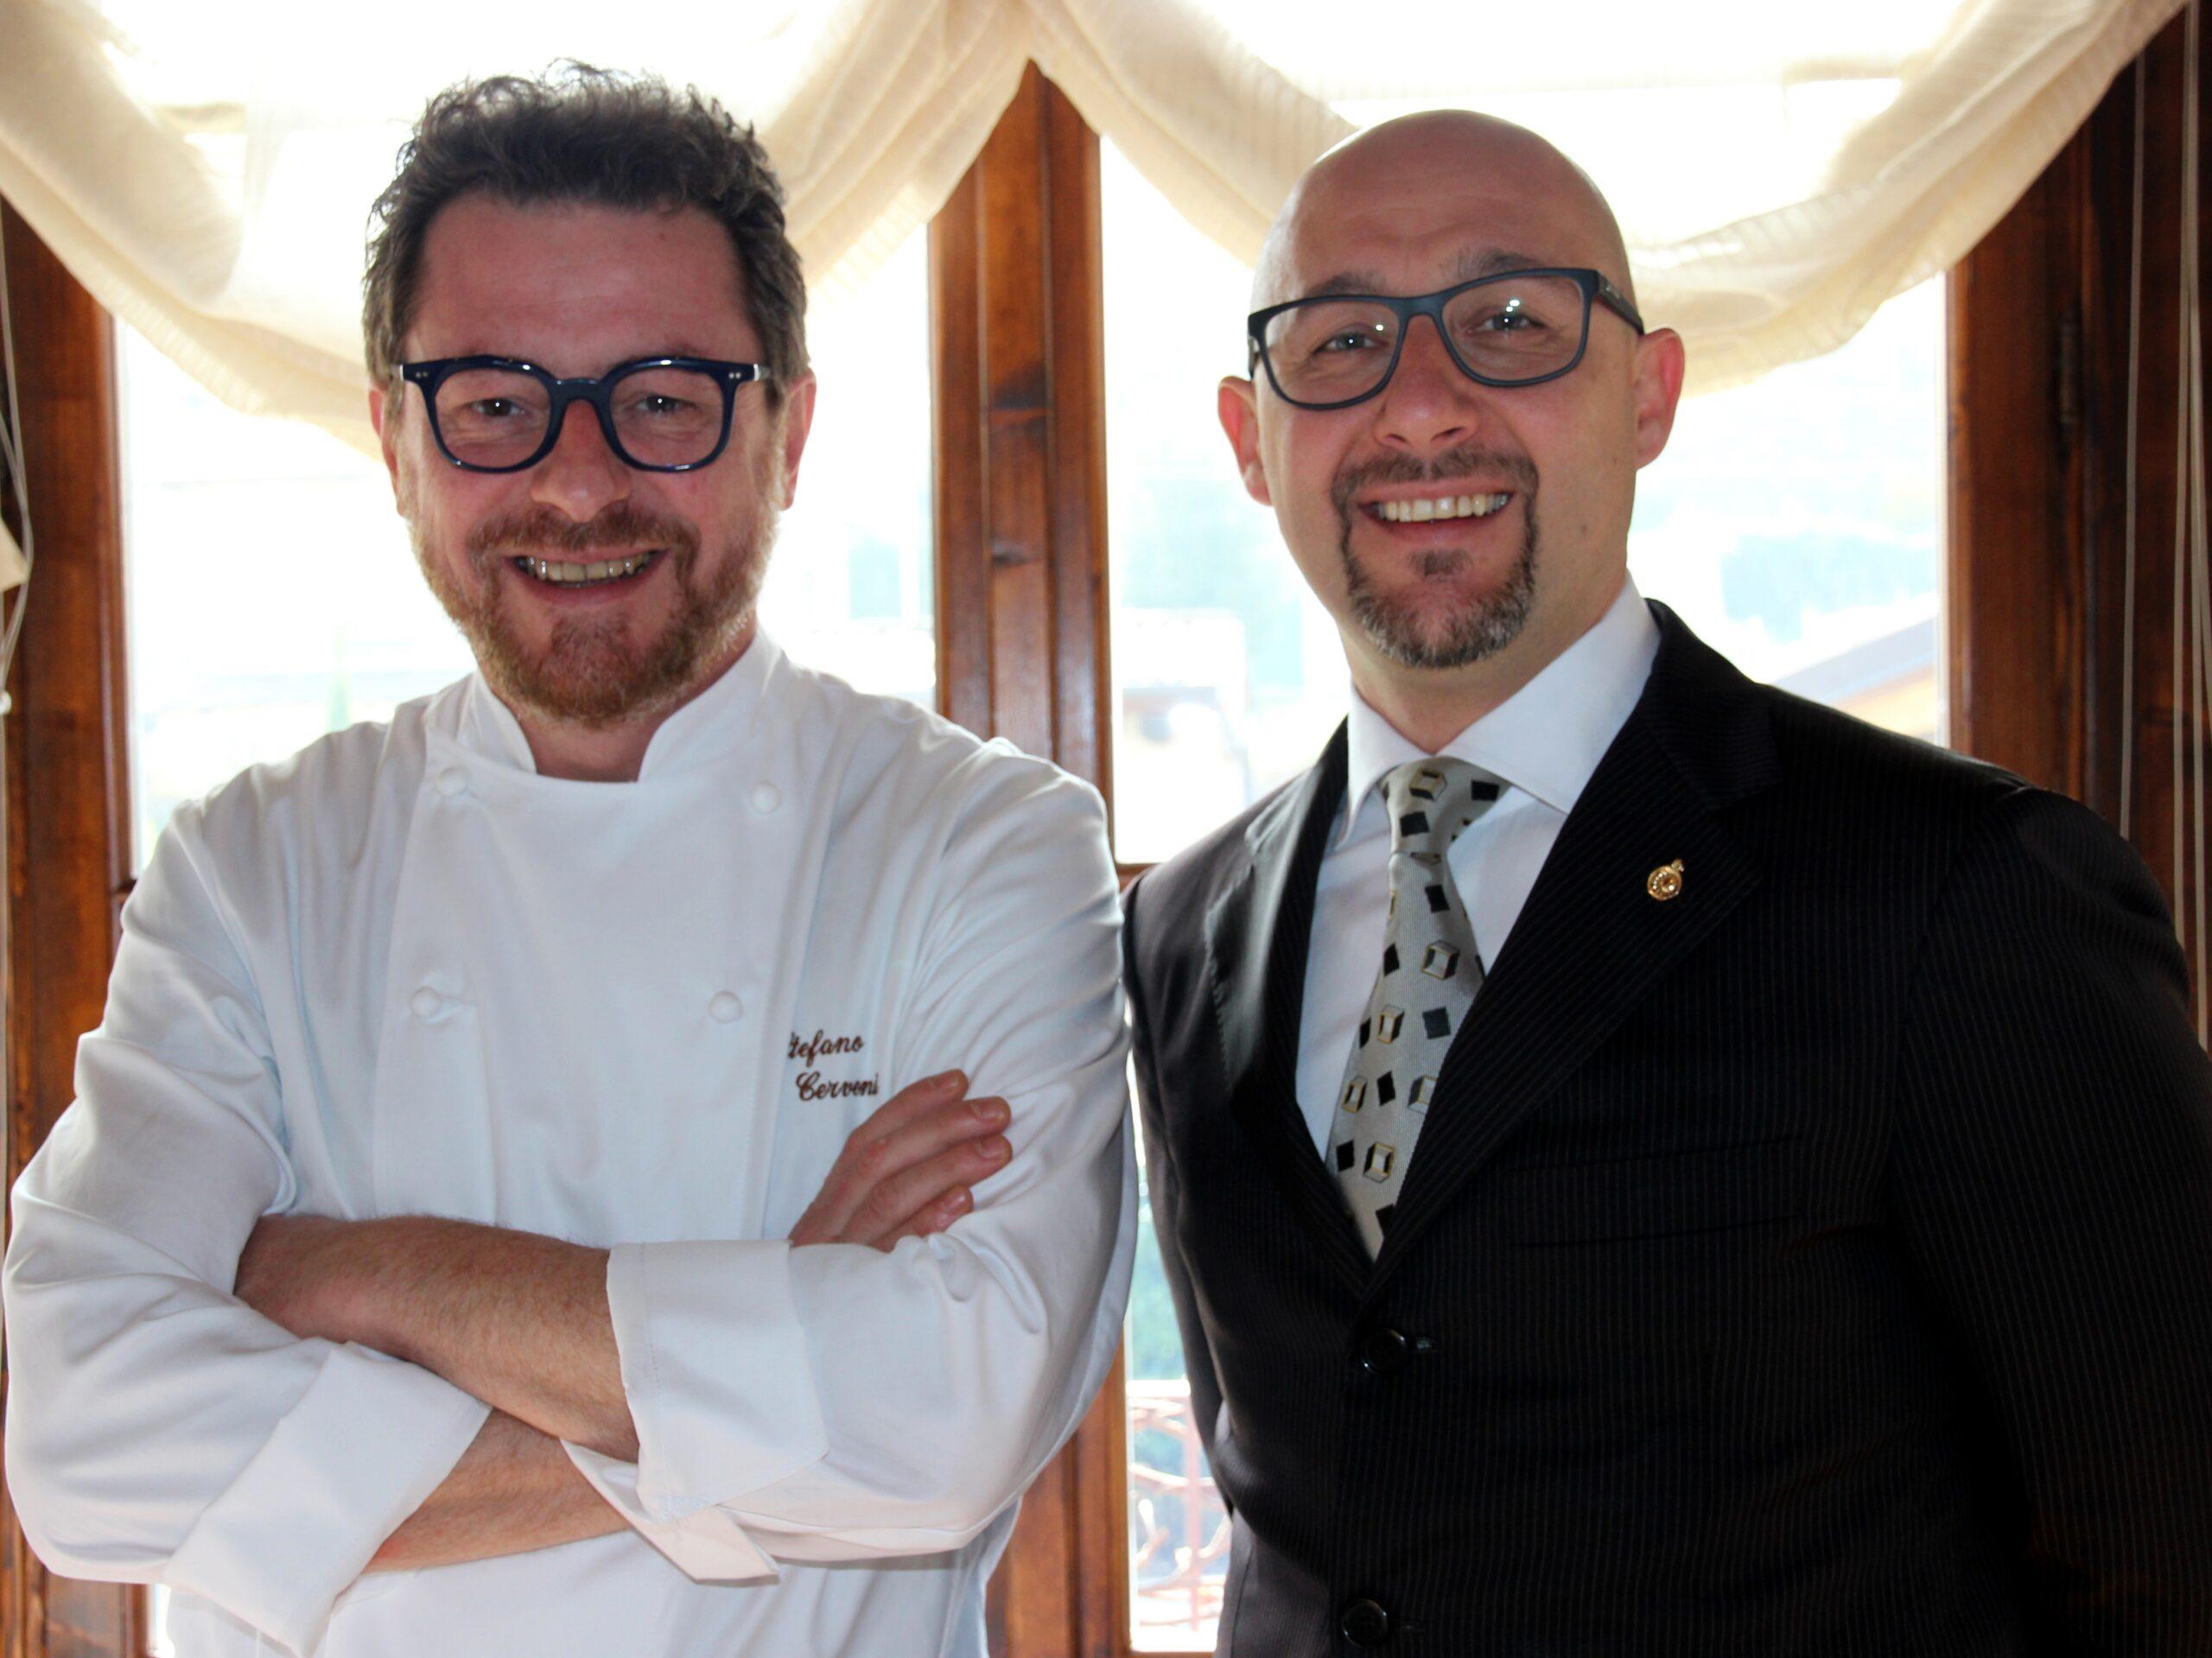 Stefano Cerveni and Gianluca Goatelli